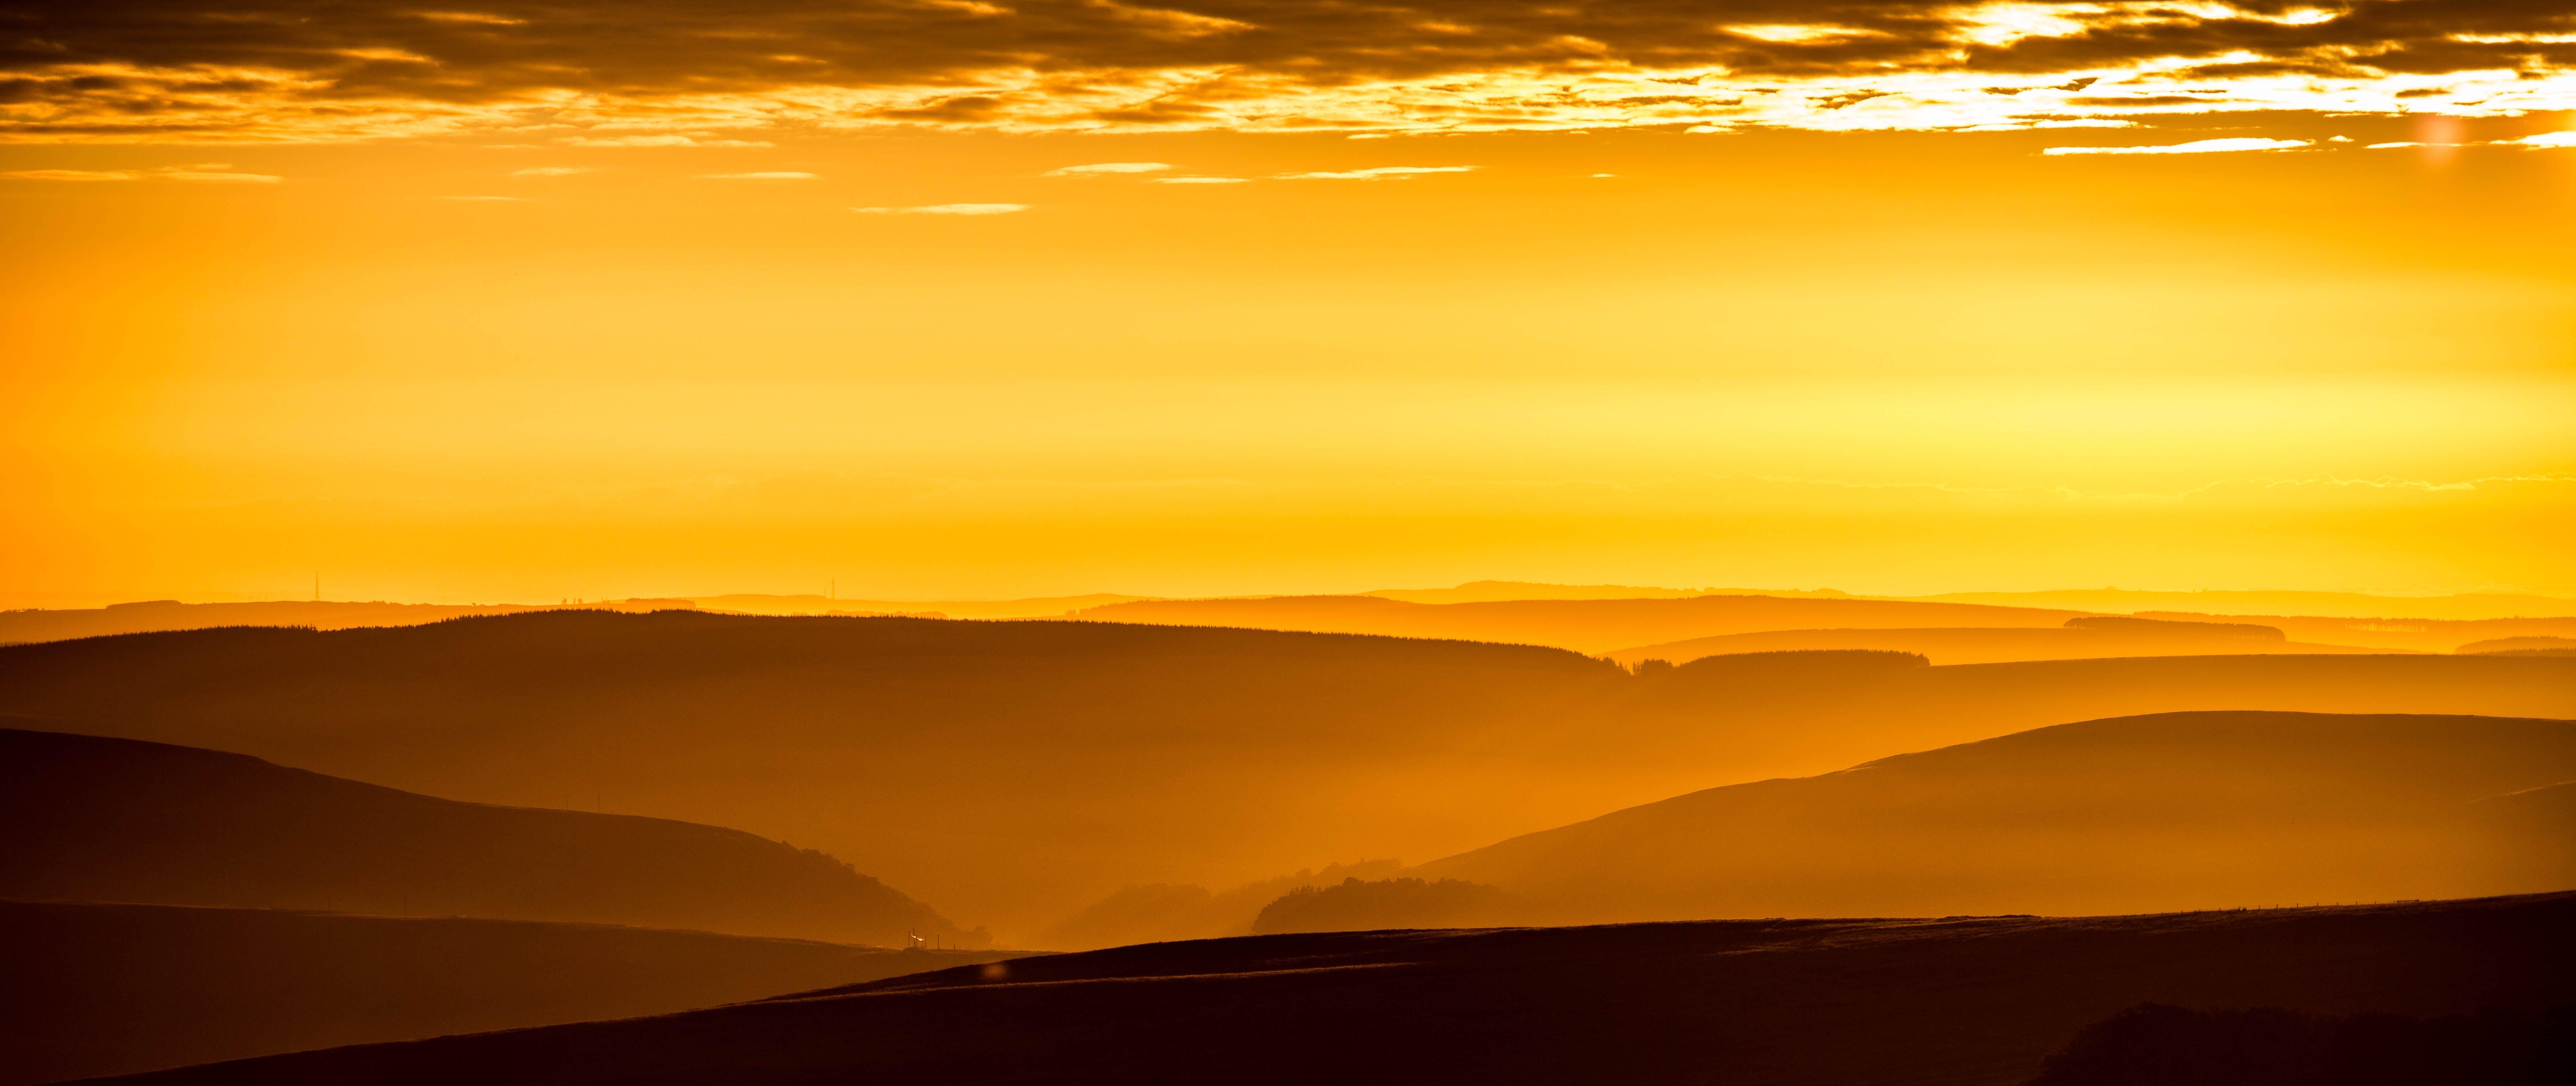 dawn, desert, dusk